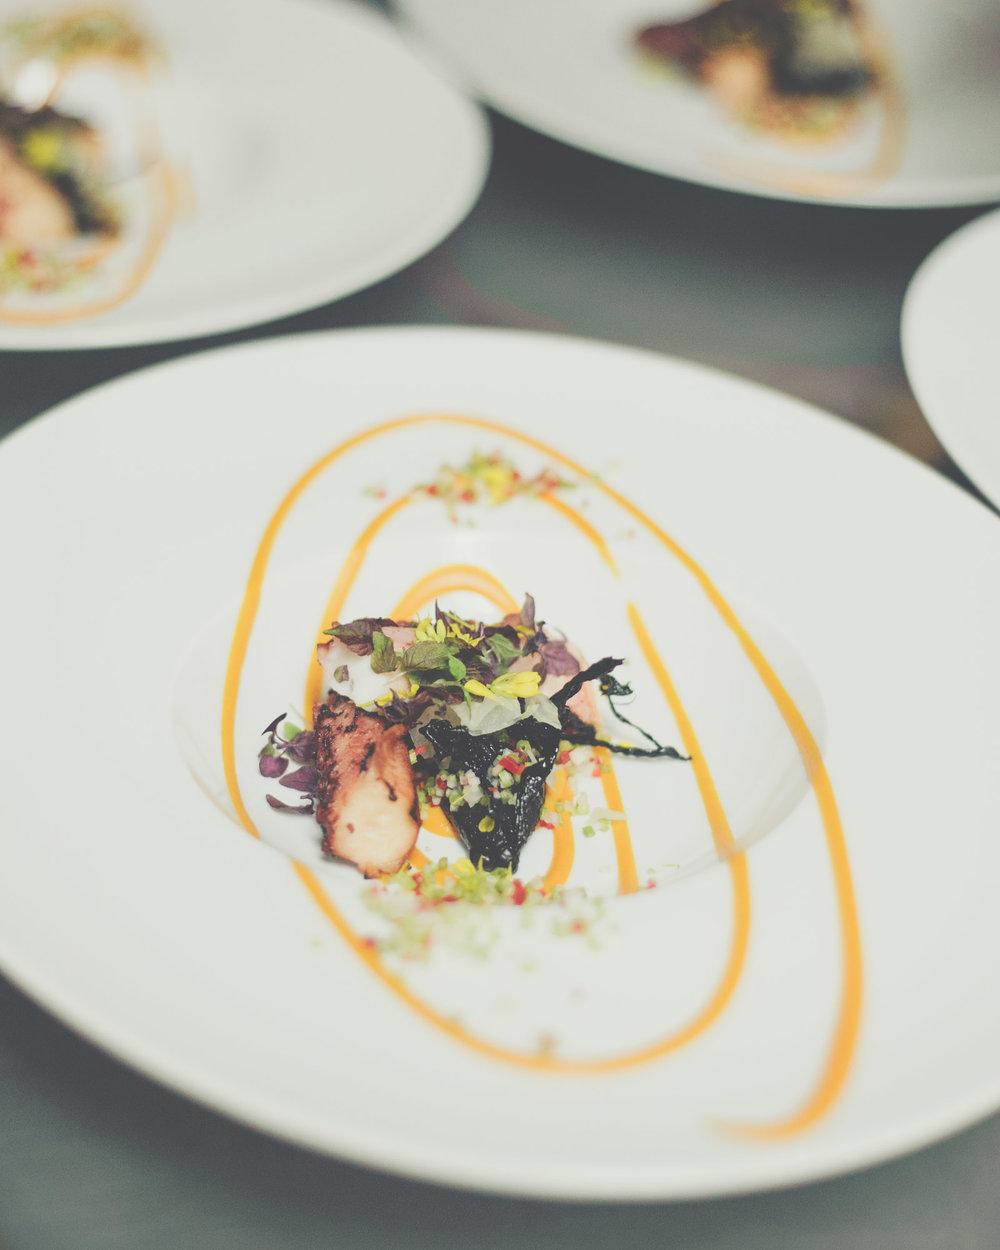 Spanish Octopus | Edwards Ham Consommé, Black Trumpet Mushroom, Clams, Kohlrabi